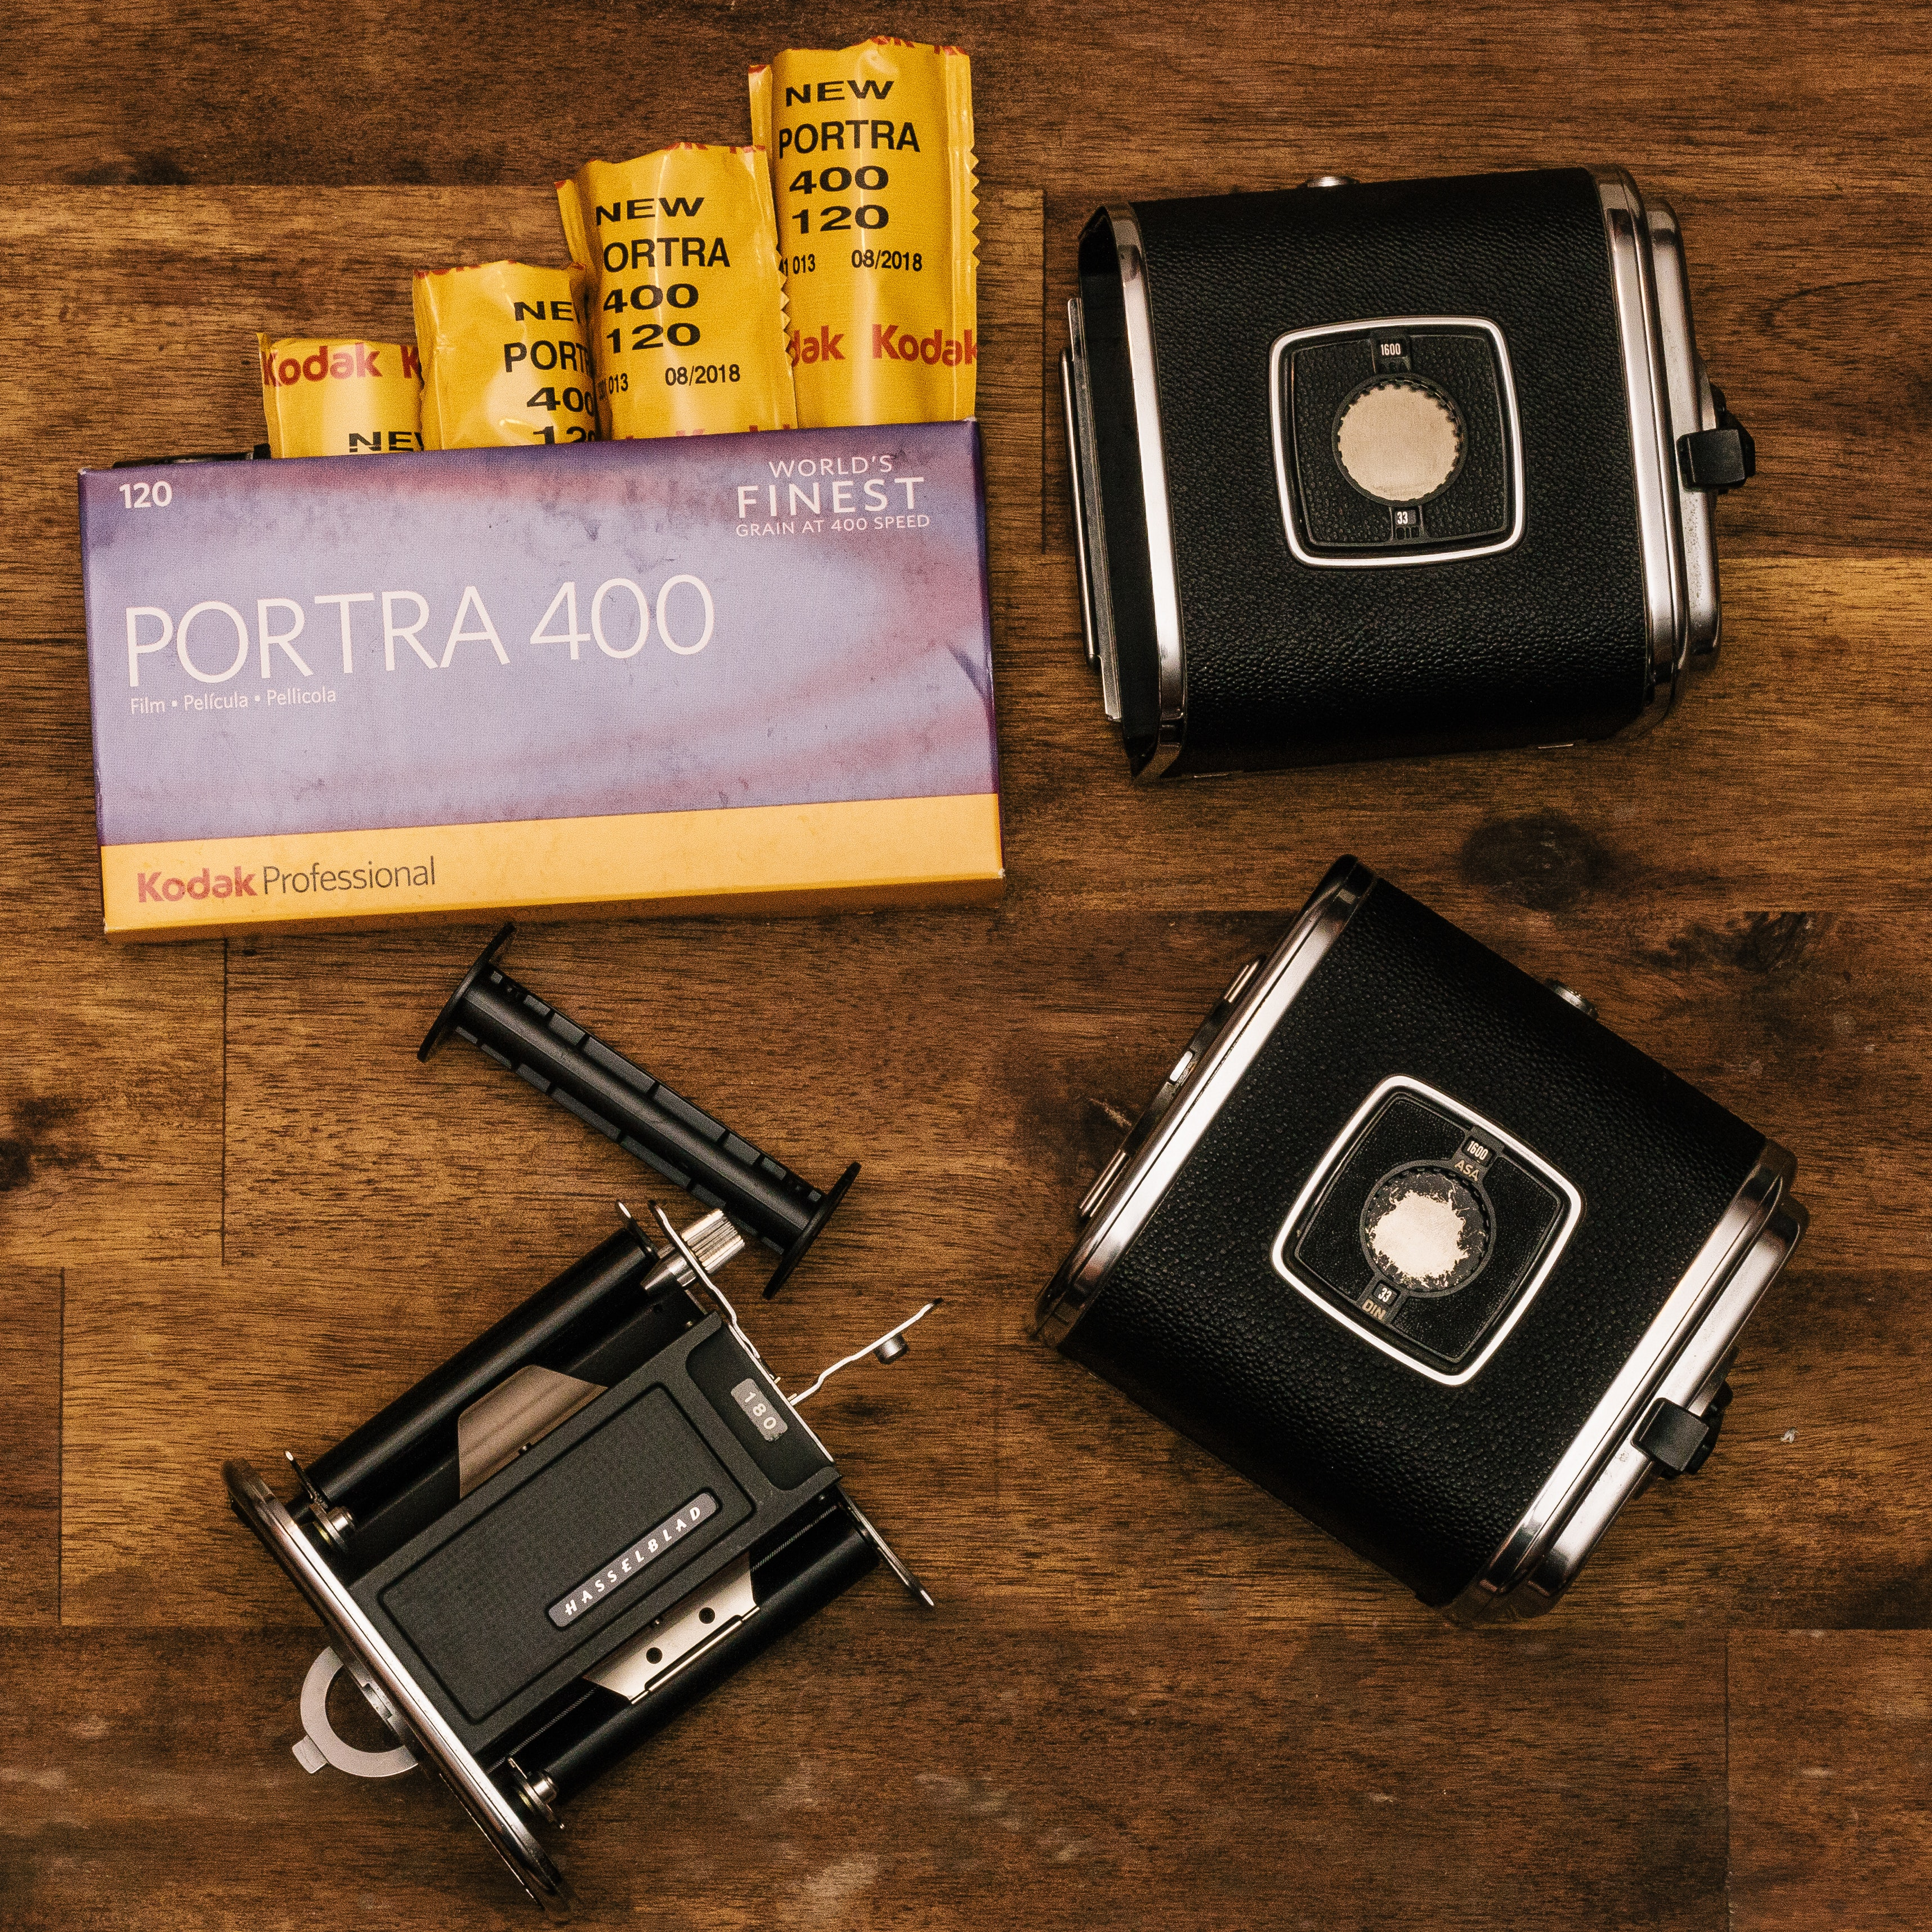 Kodak Porta 400 With Black Cases, Analog, Plastic, Optical, Paper, HQ Photo